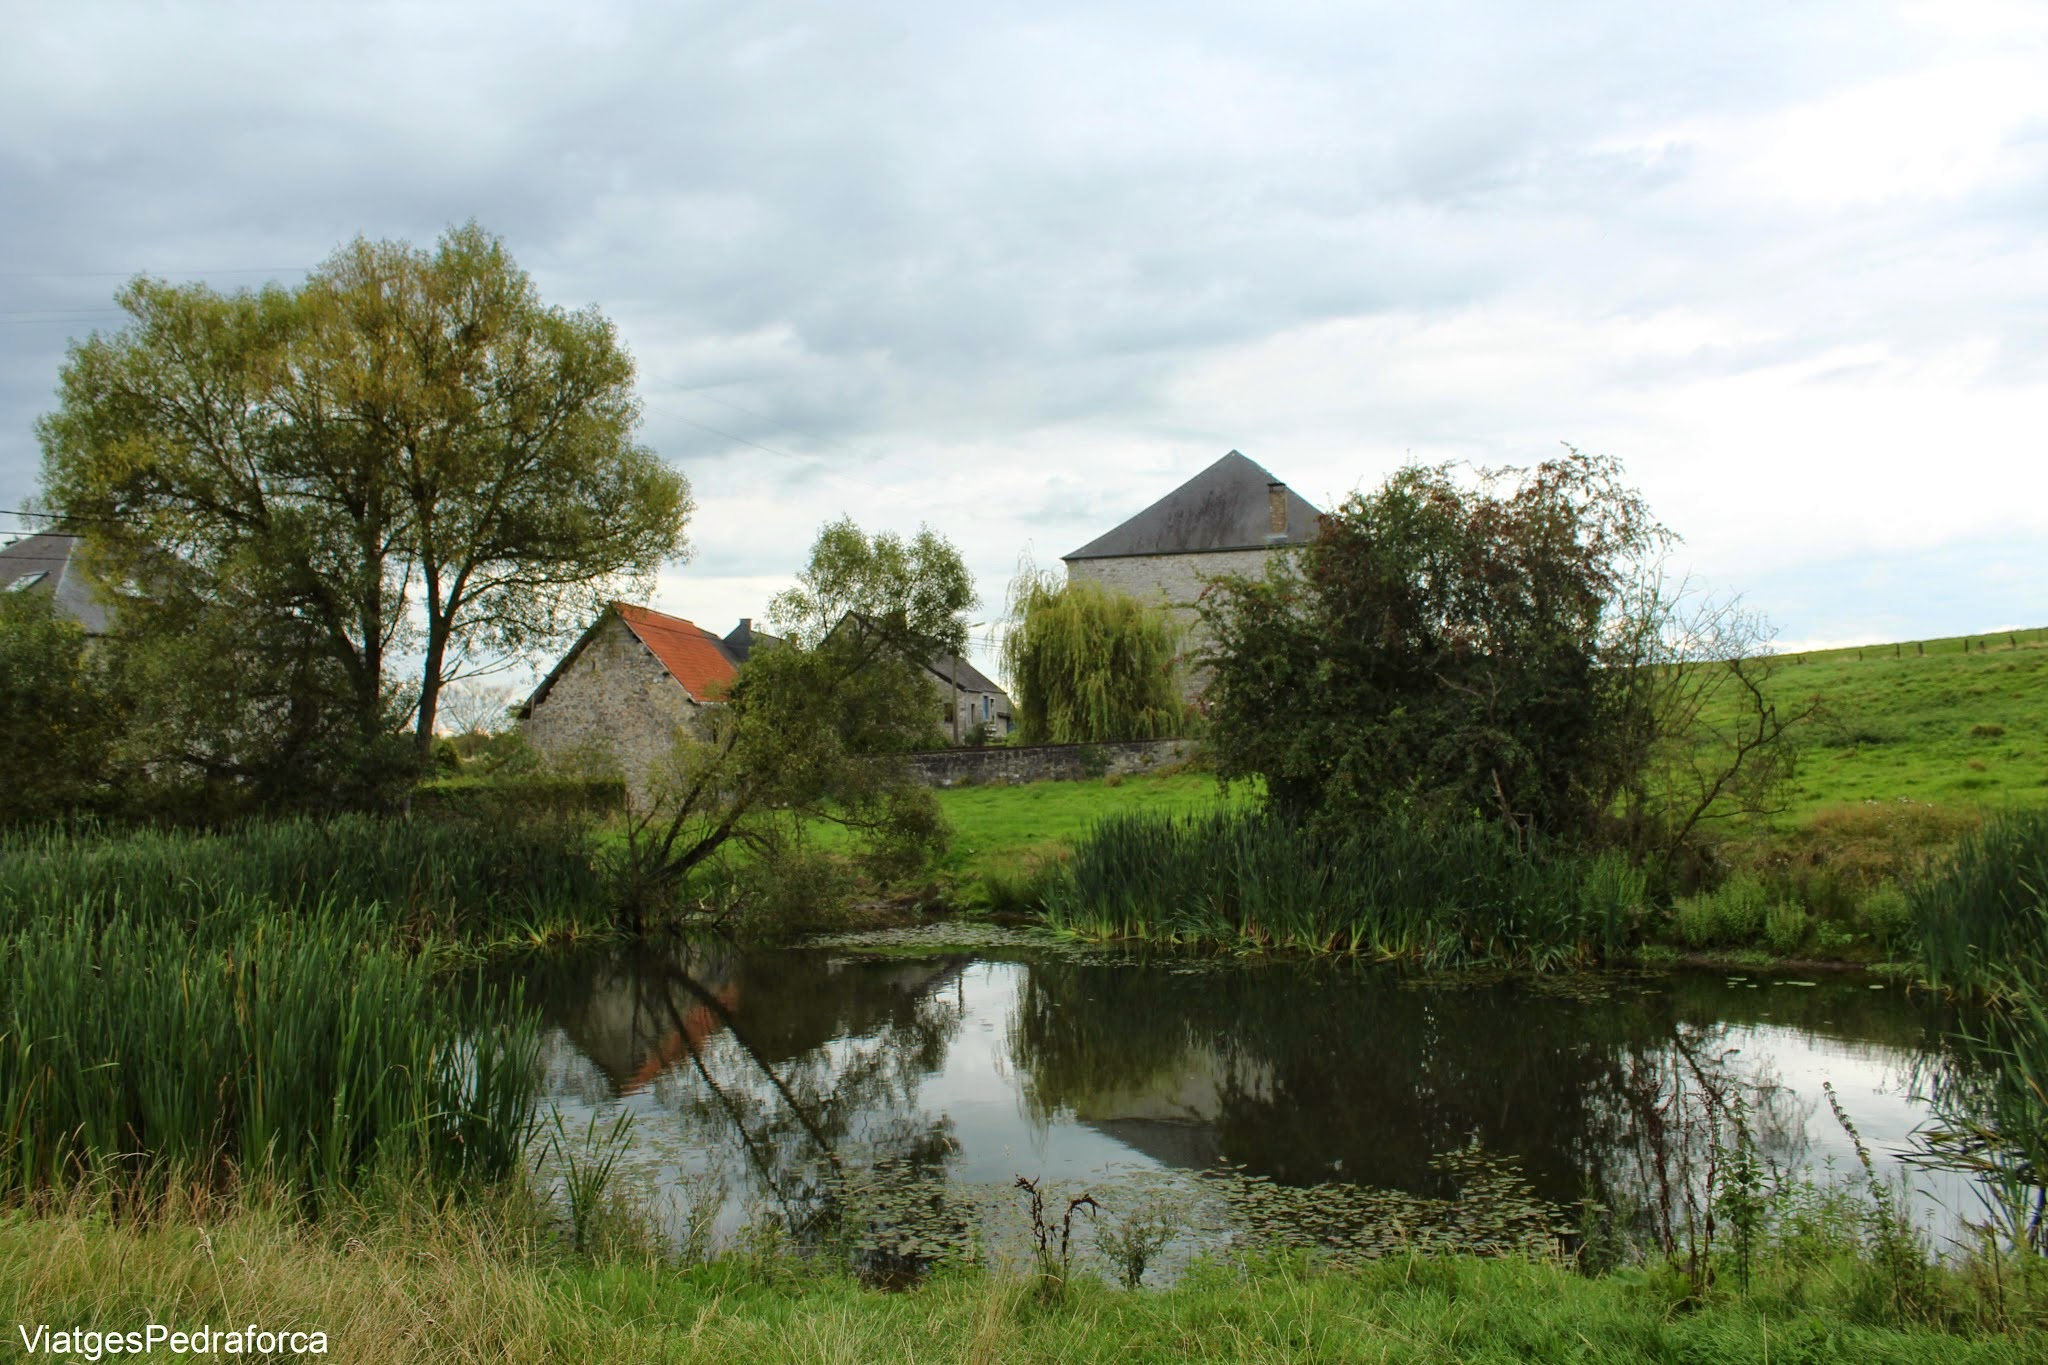 Falaën Valonia Belgica